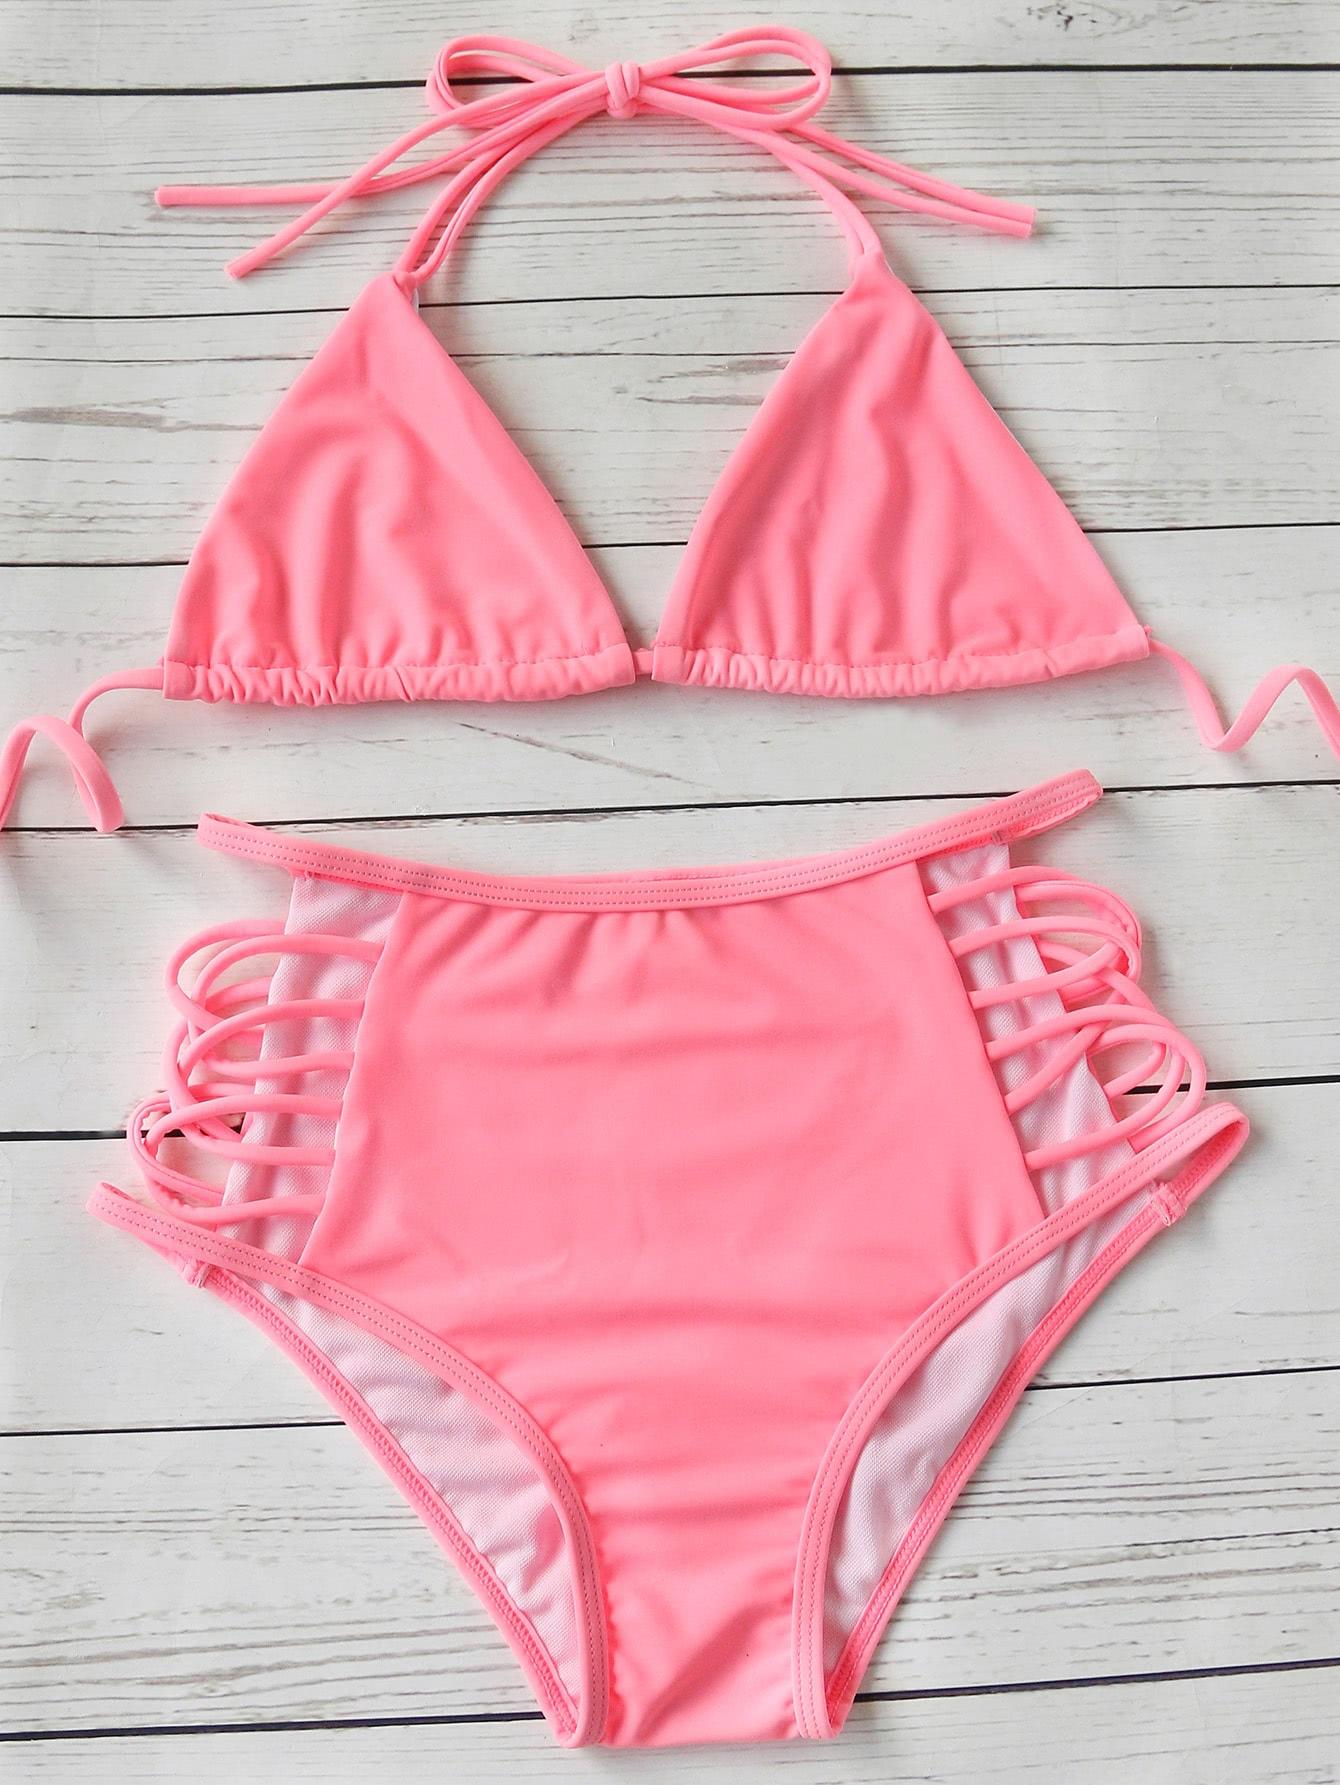 Pink Ladder Cutout Triangle High Waist Bikini Set swimwear170306301